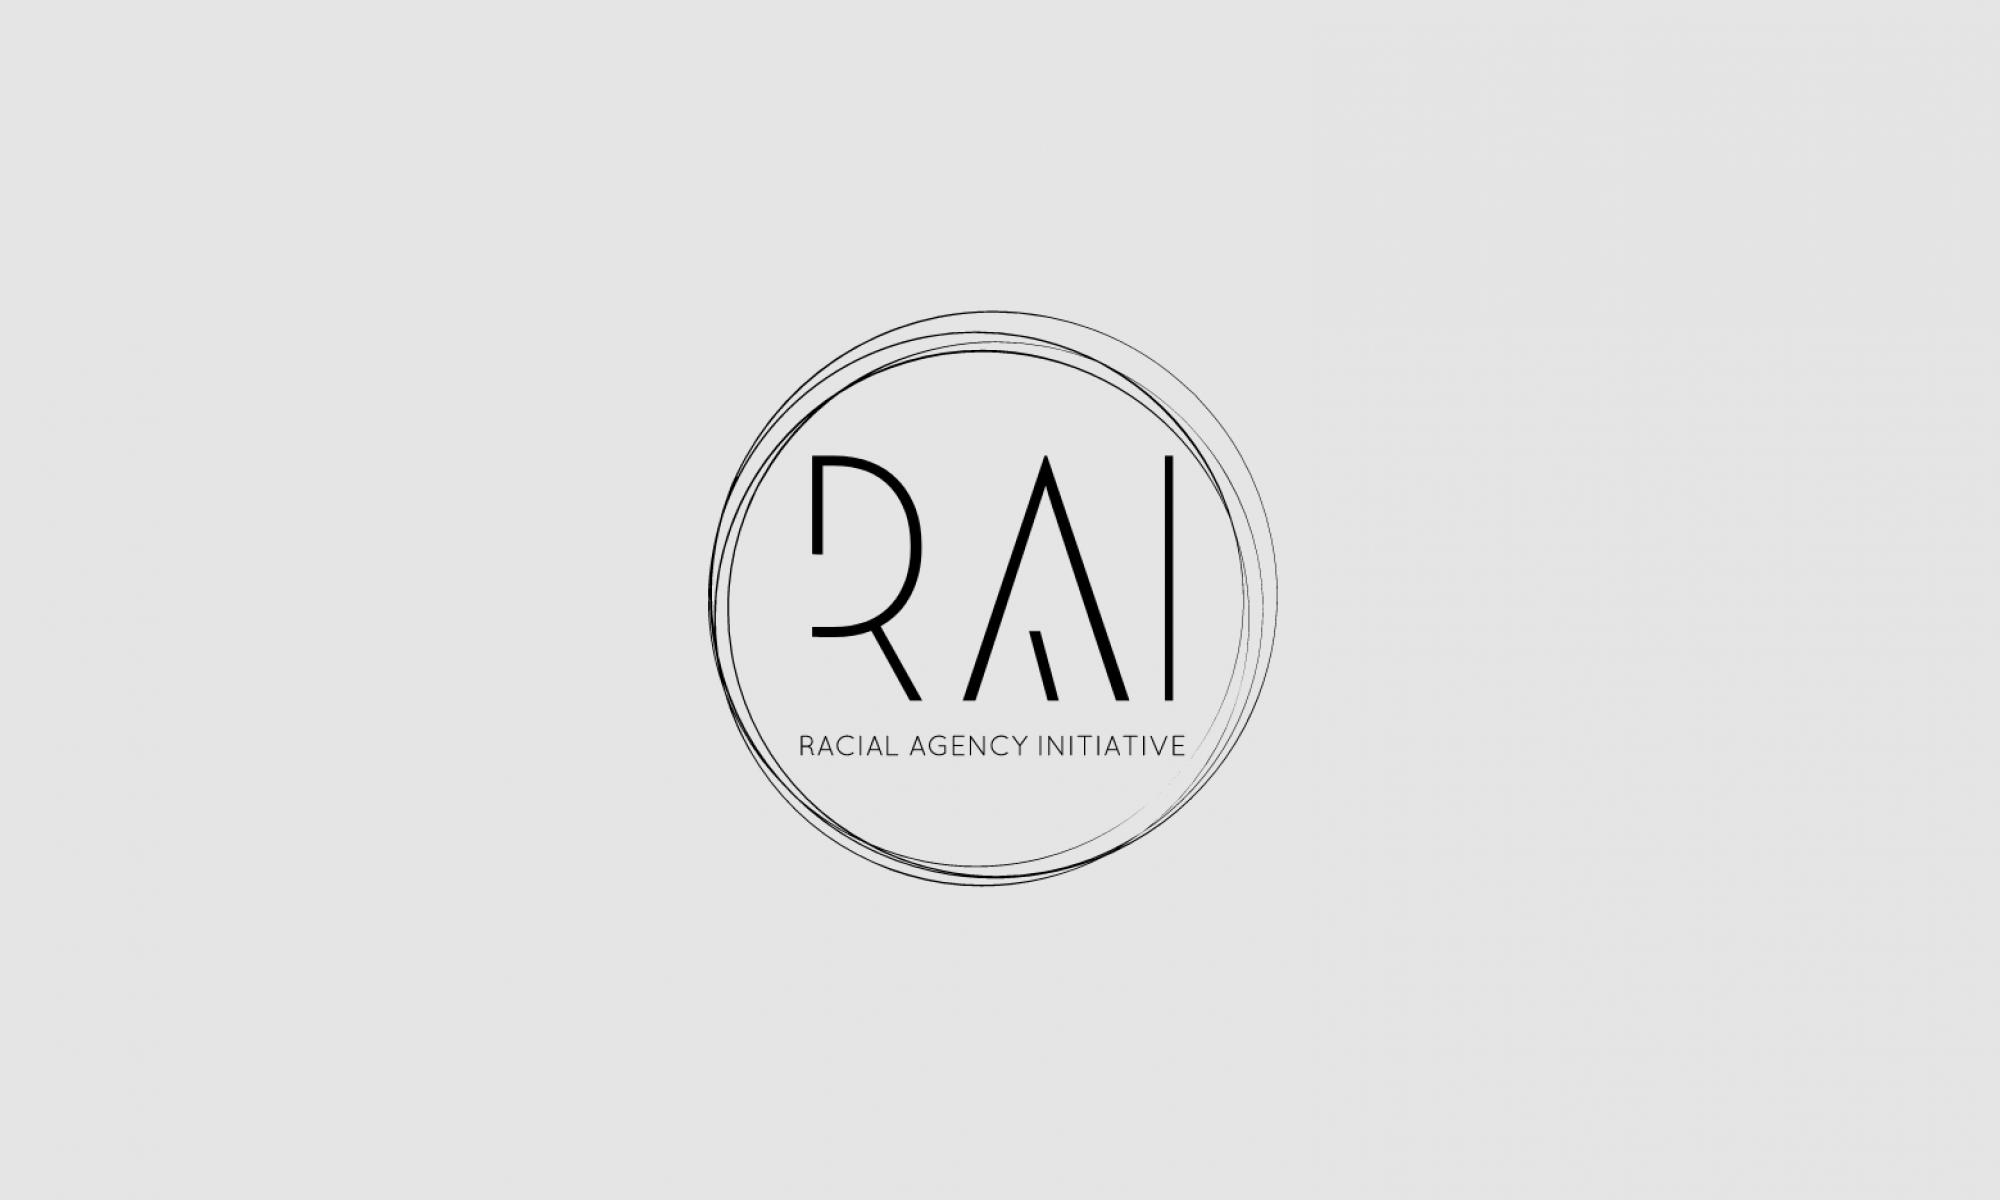 Racial Agency Initiative